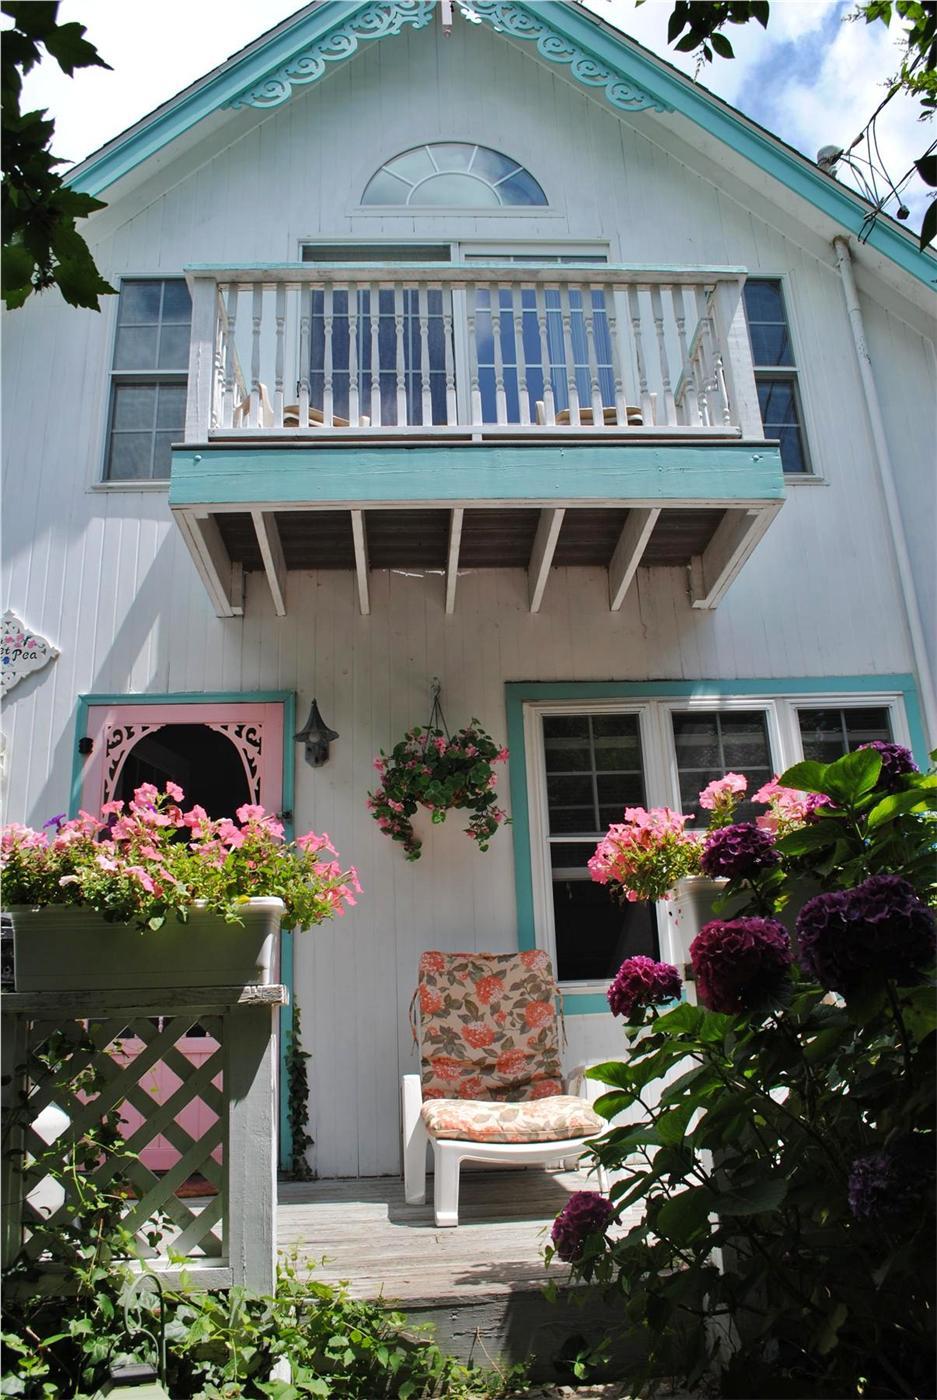 Oak bluffs vacation rental home in martha 39 s vineyard ma for Martha s vineyard gingerbread cottages